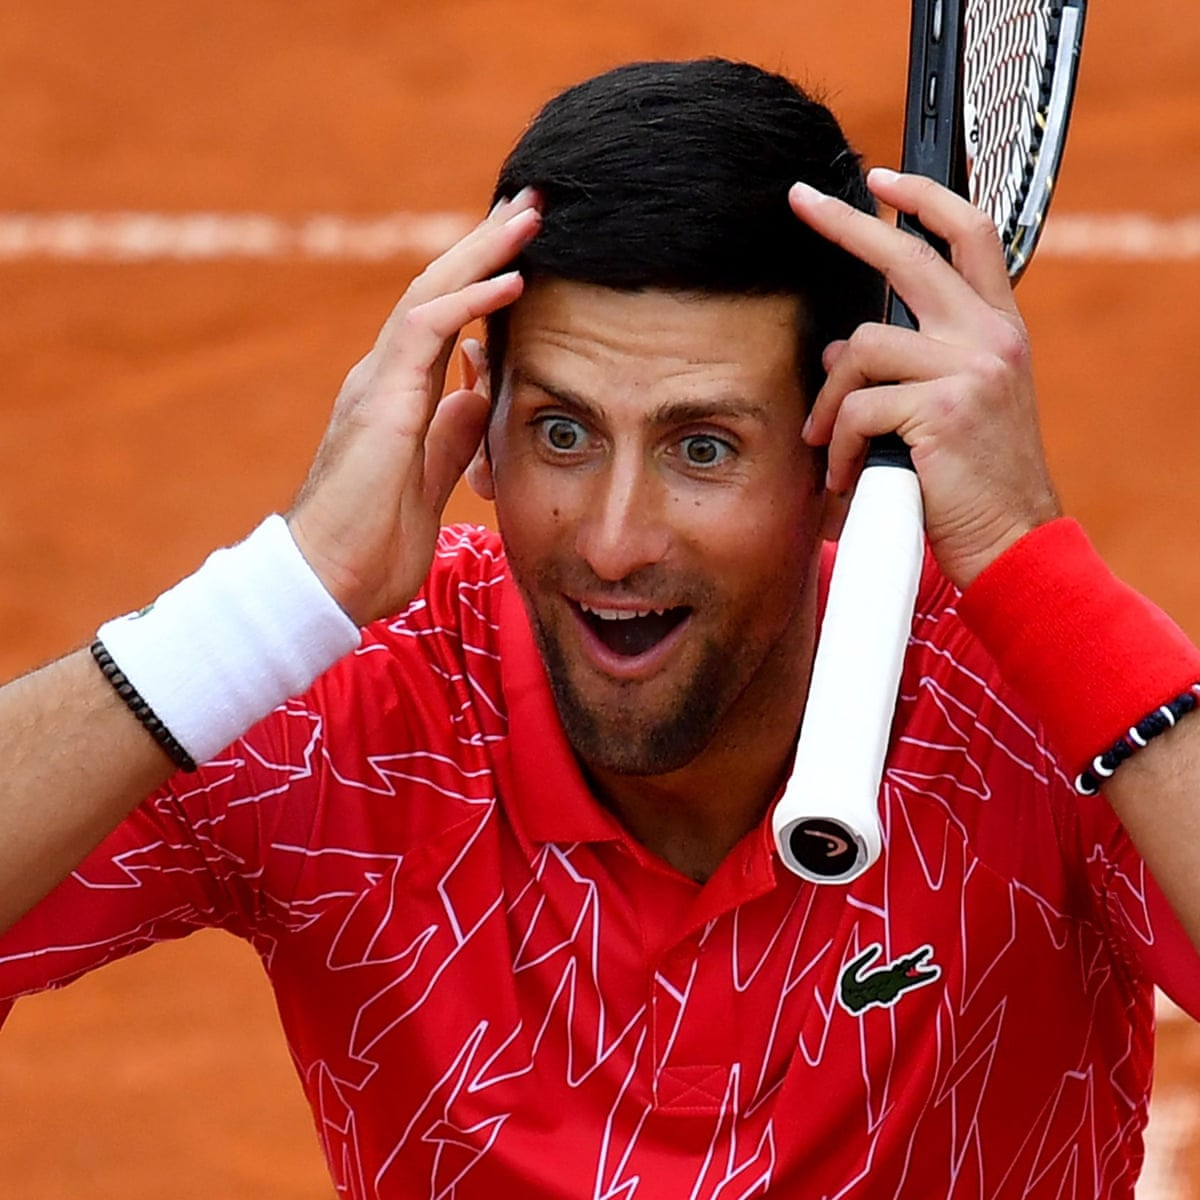 Novak Djokovic Attacks Witch Hunt And Says He Has No Regrets Over Adria Tour Novak Djokovic The Guardian